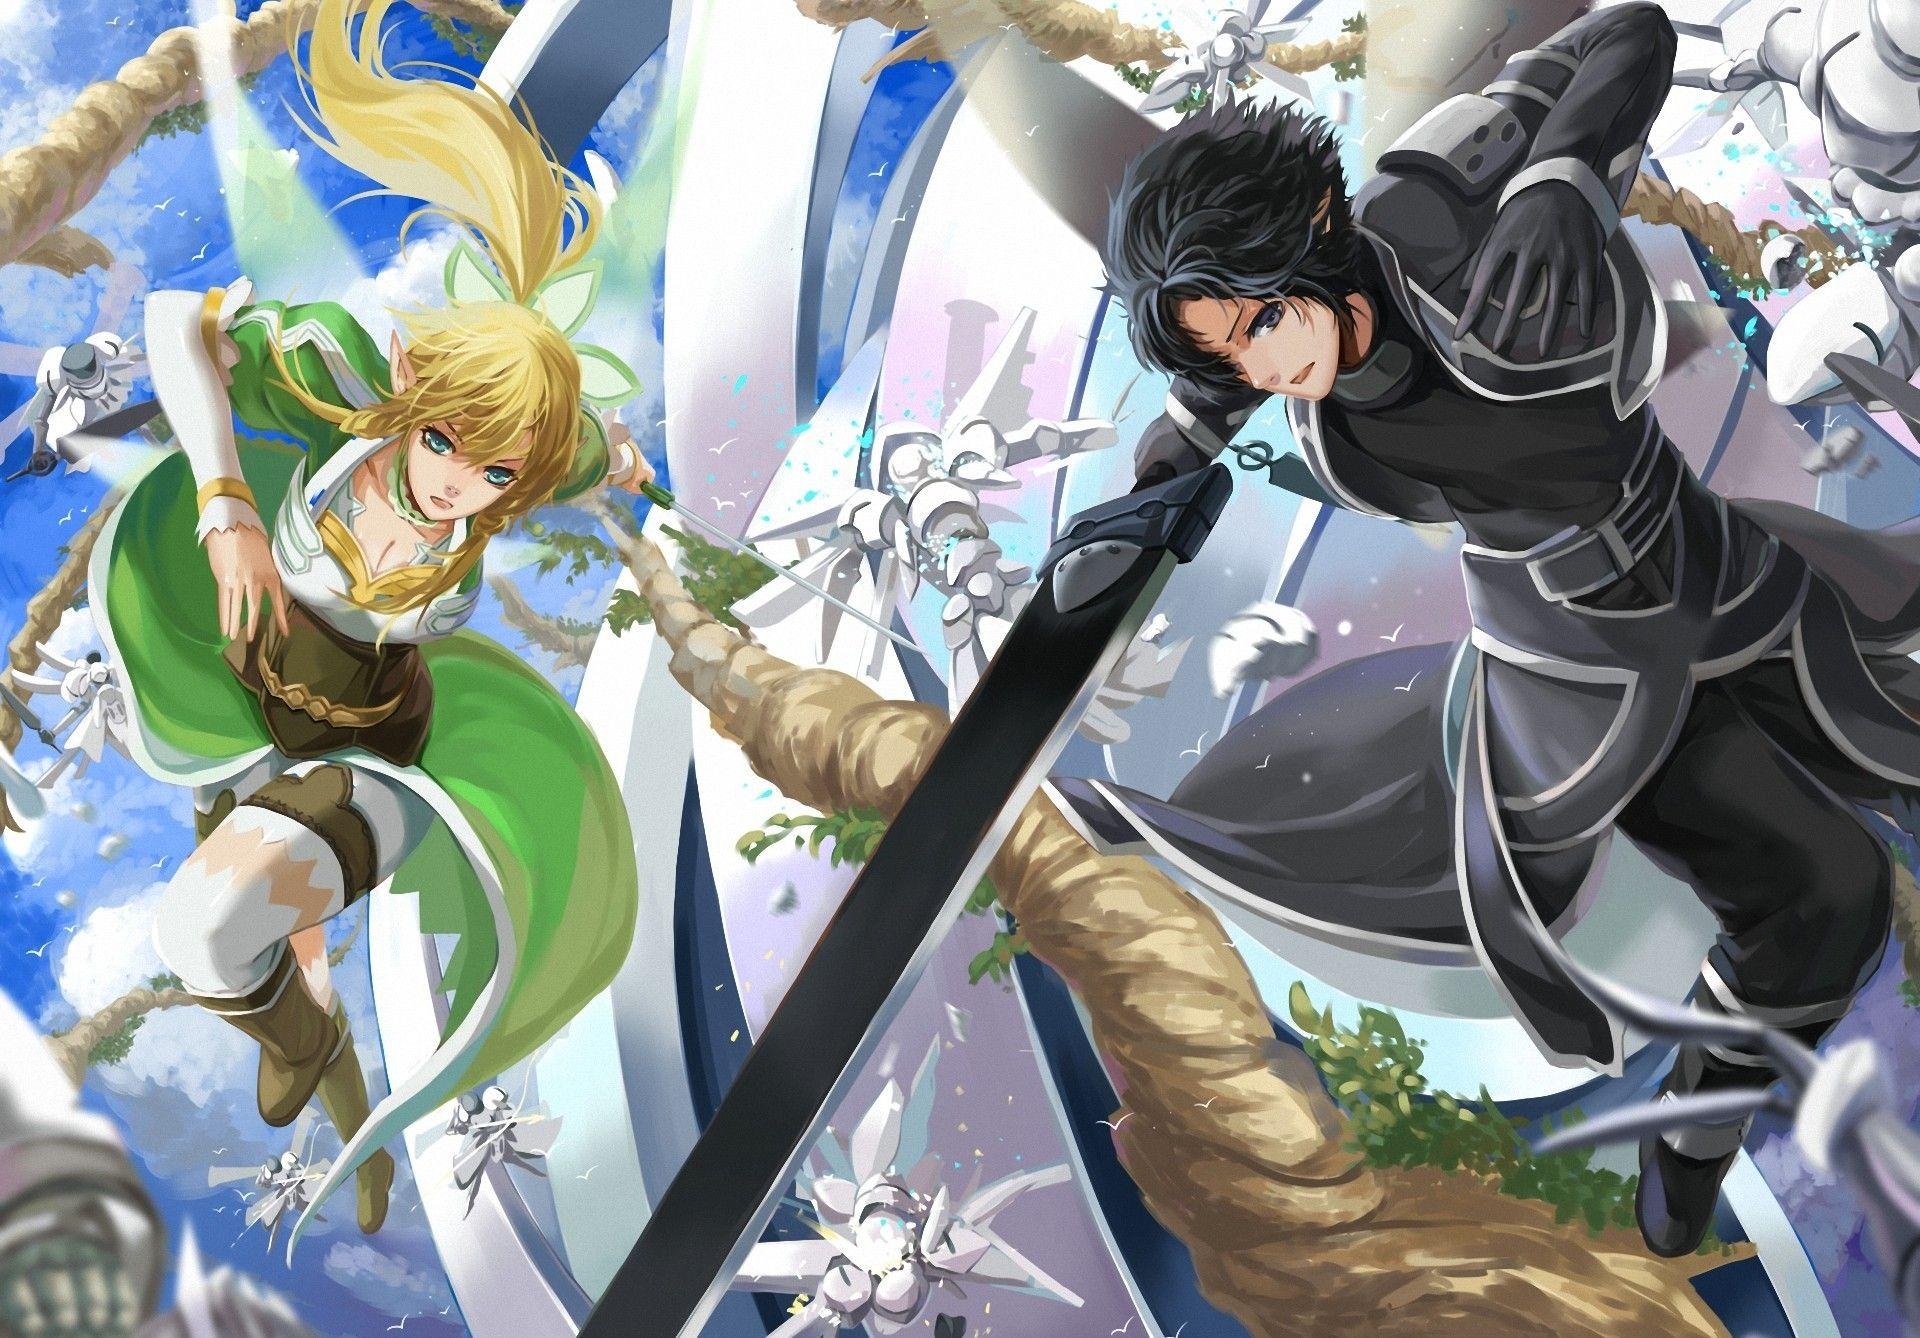 Anime Sword Art Online Leafa Kirito Sfondo (With images)